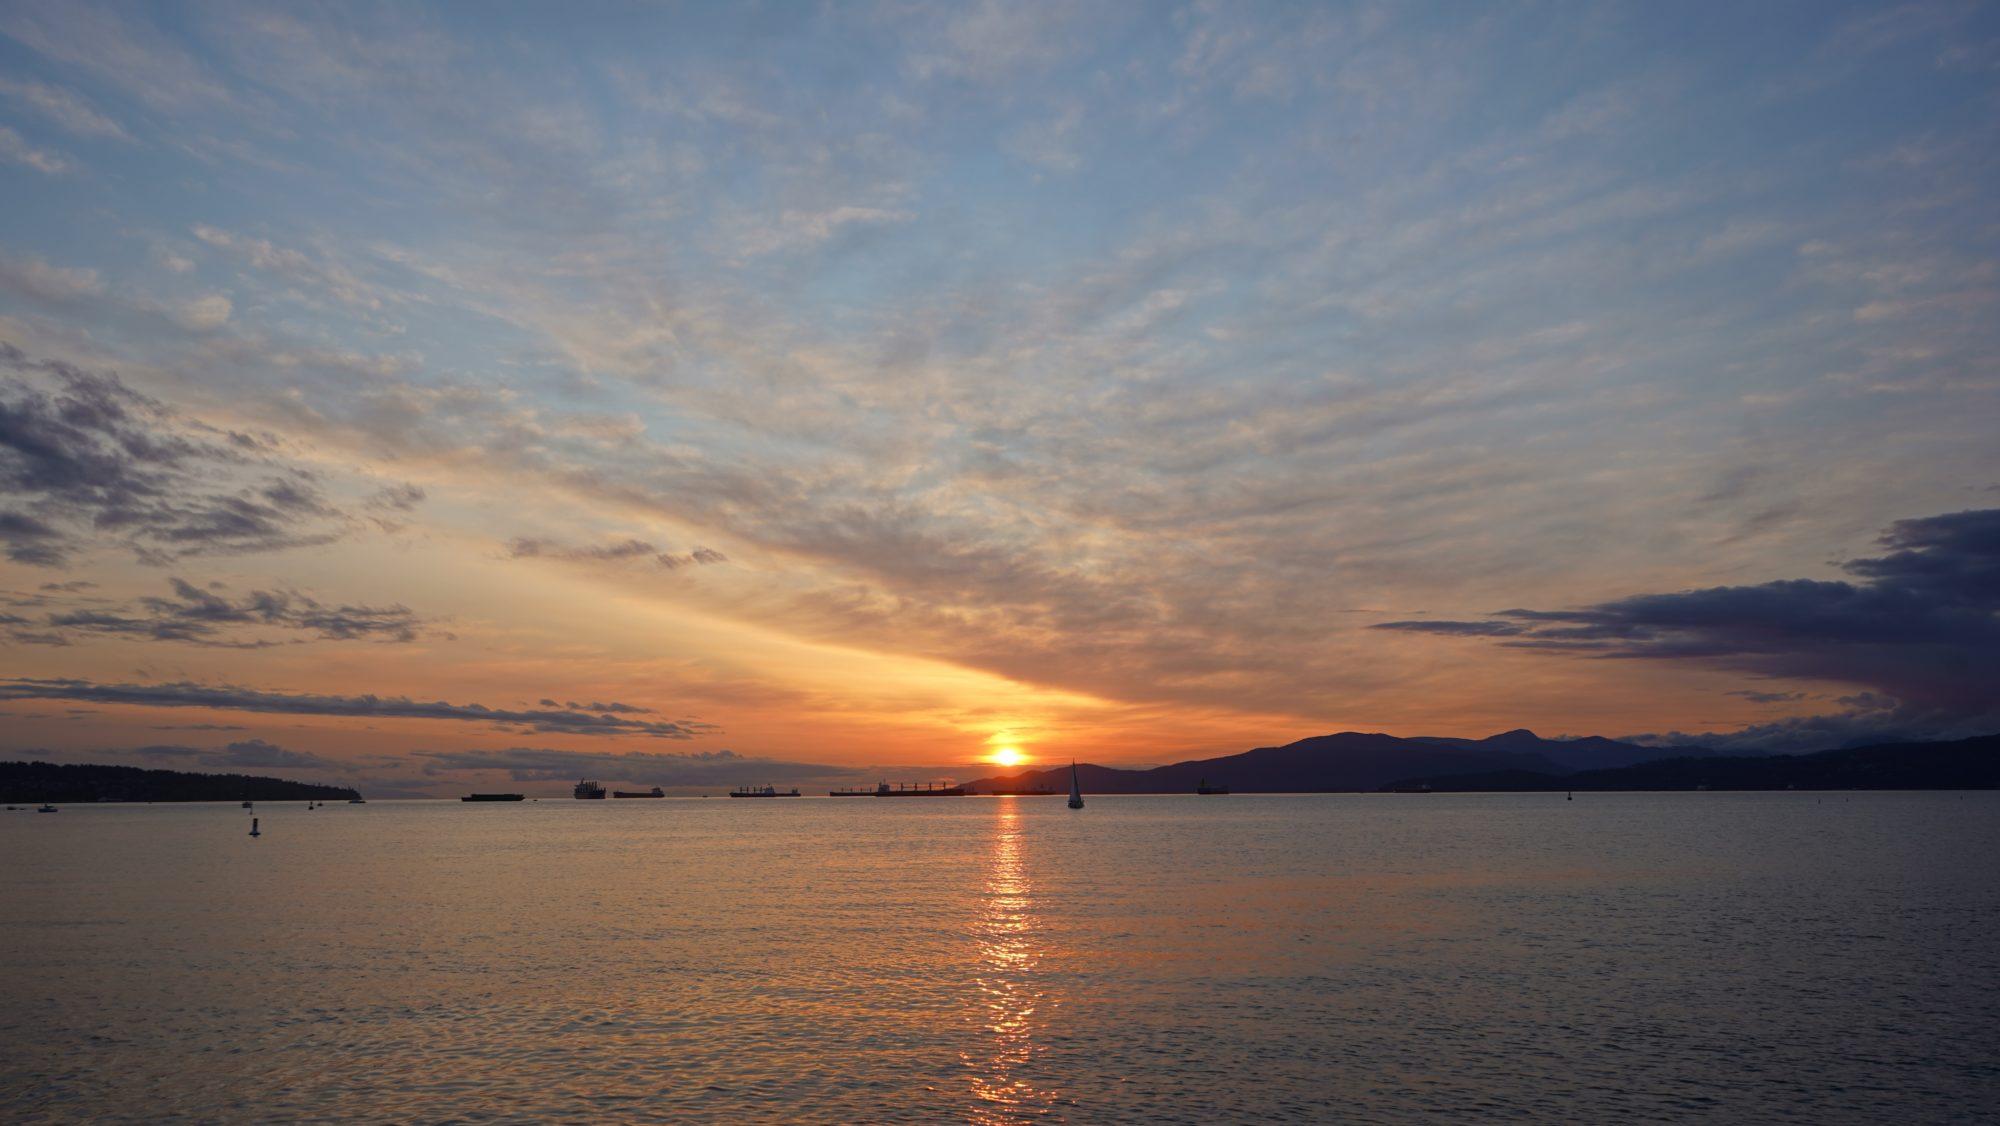 Sunset in English Bay